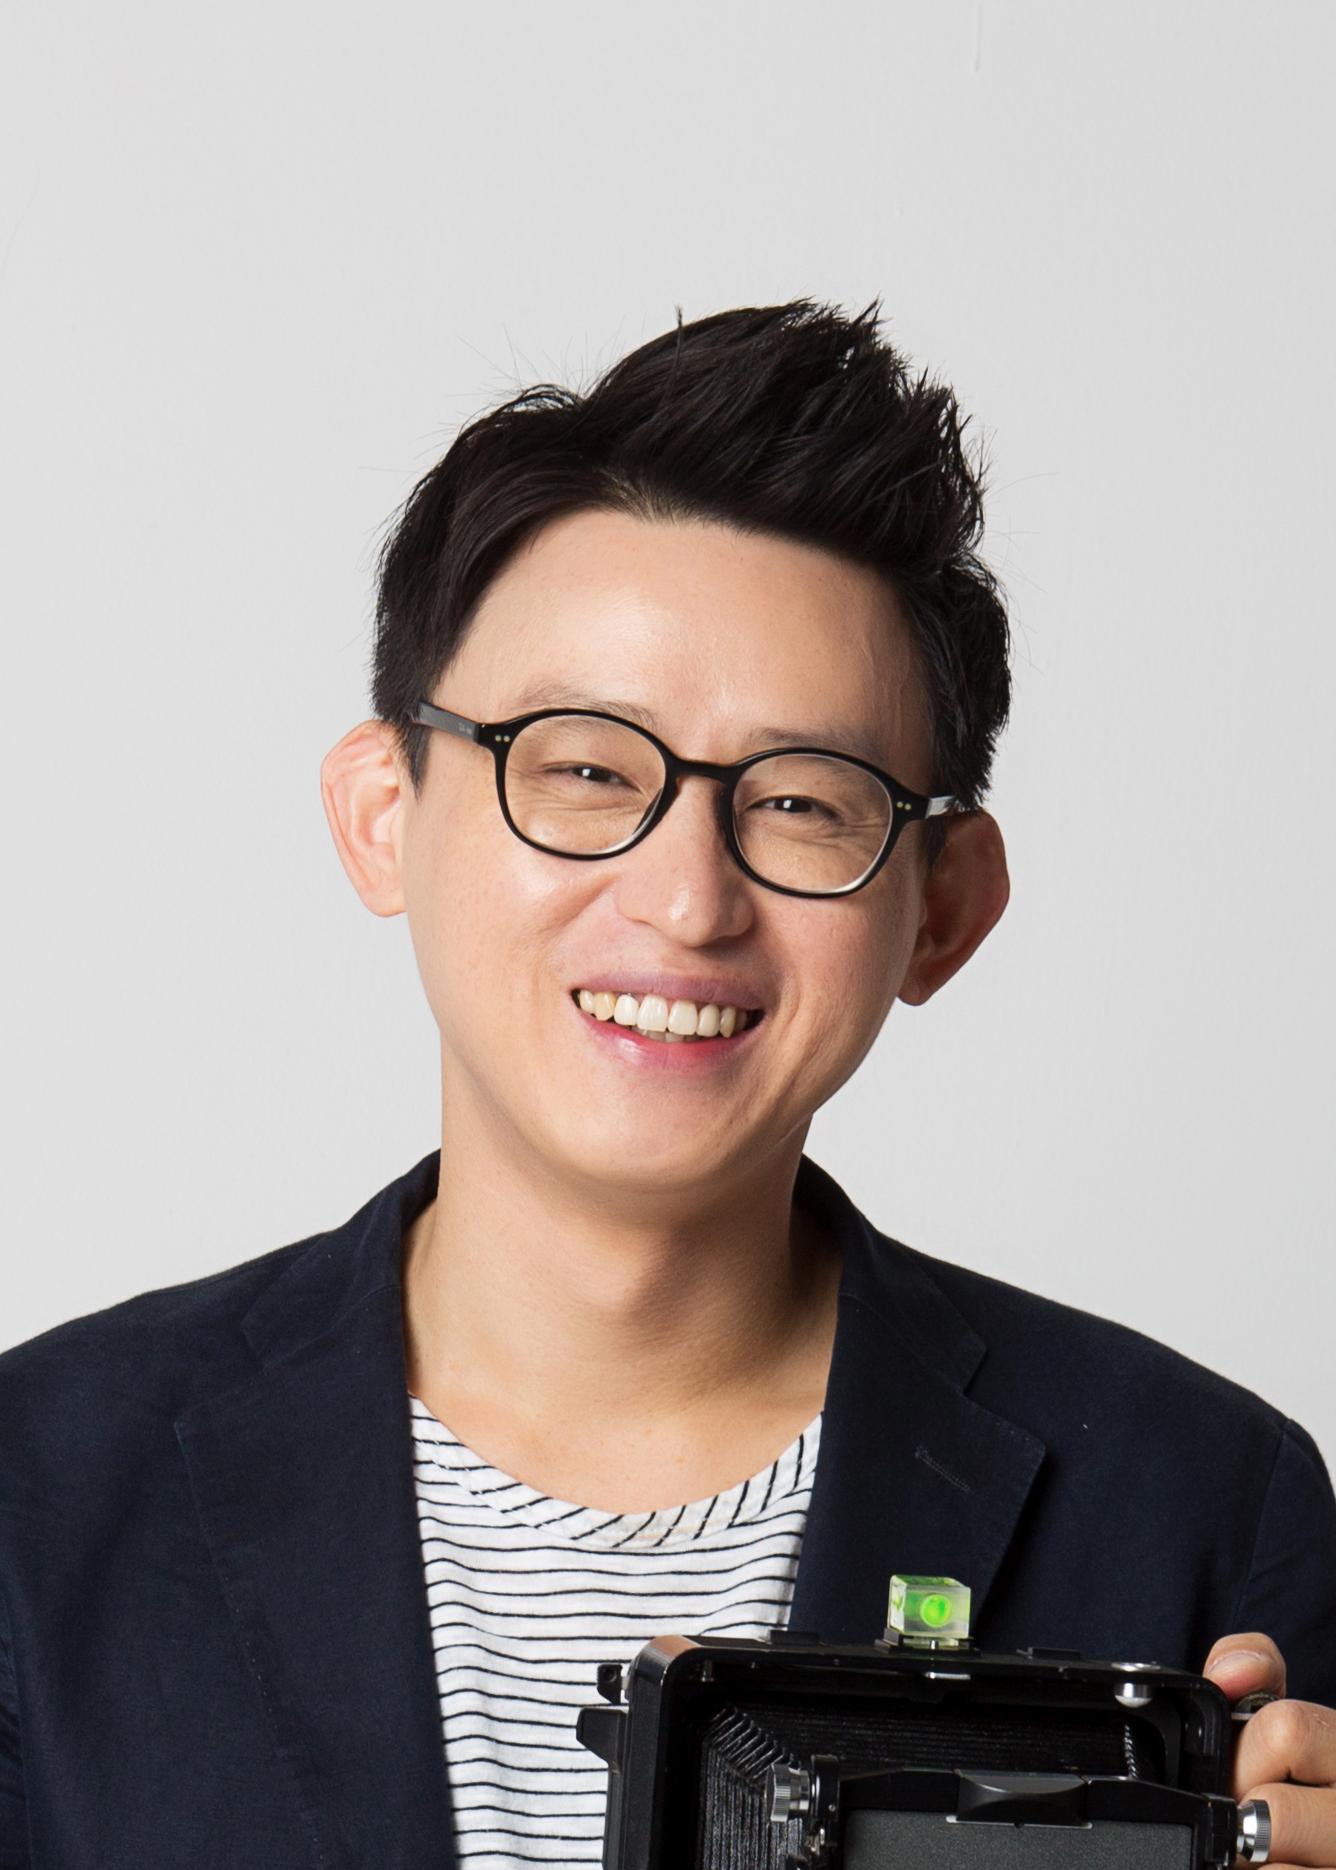 Hyongryol Bak